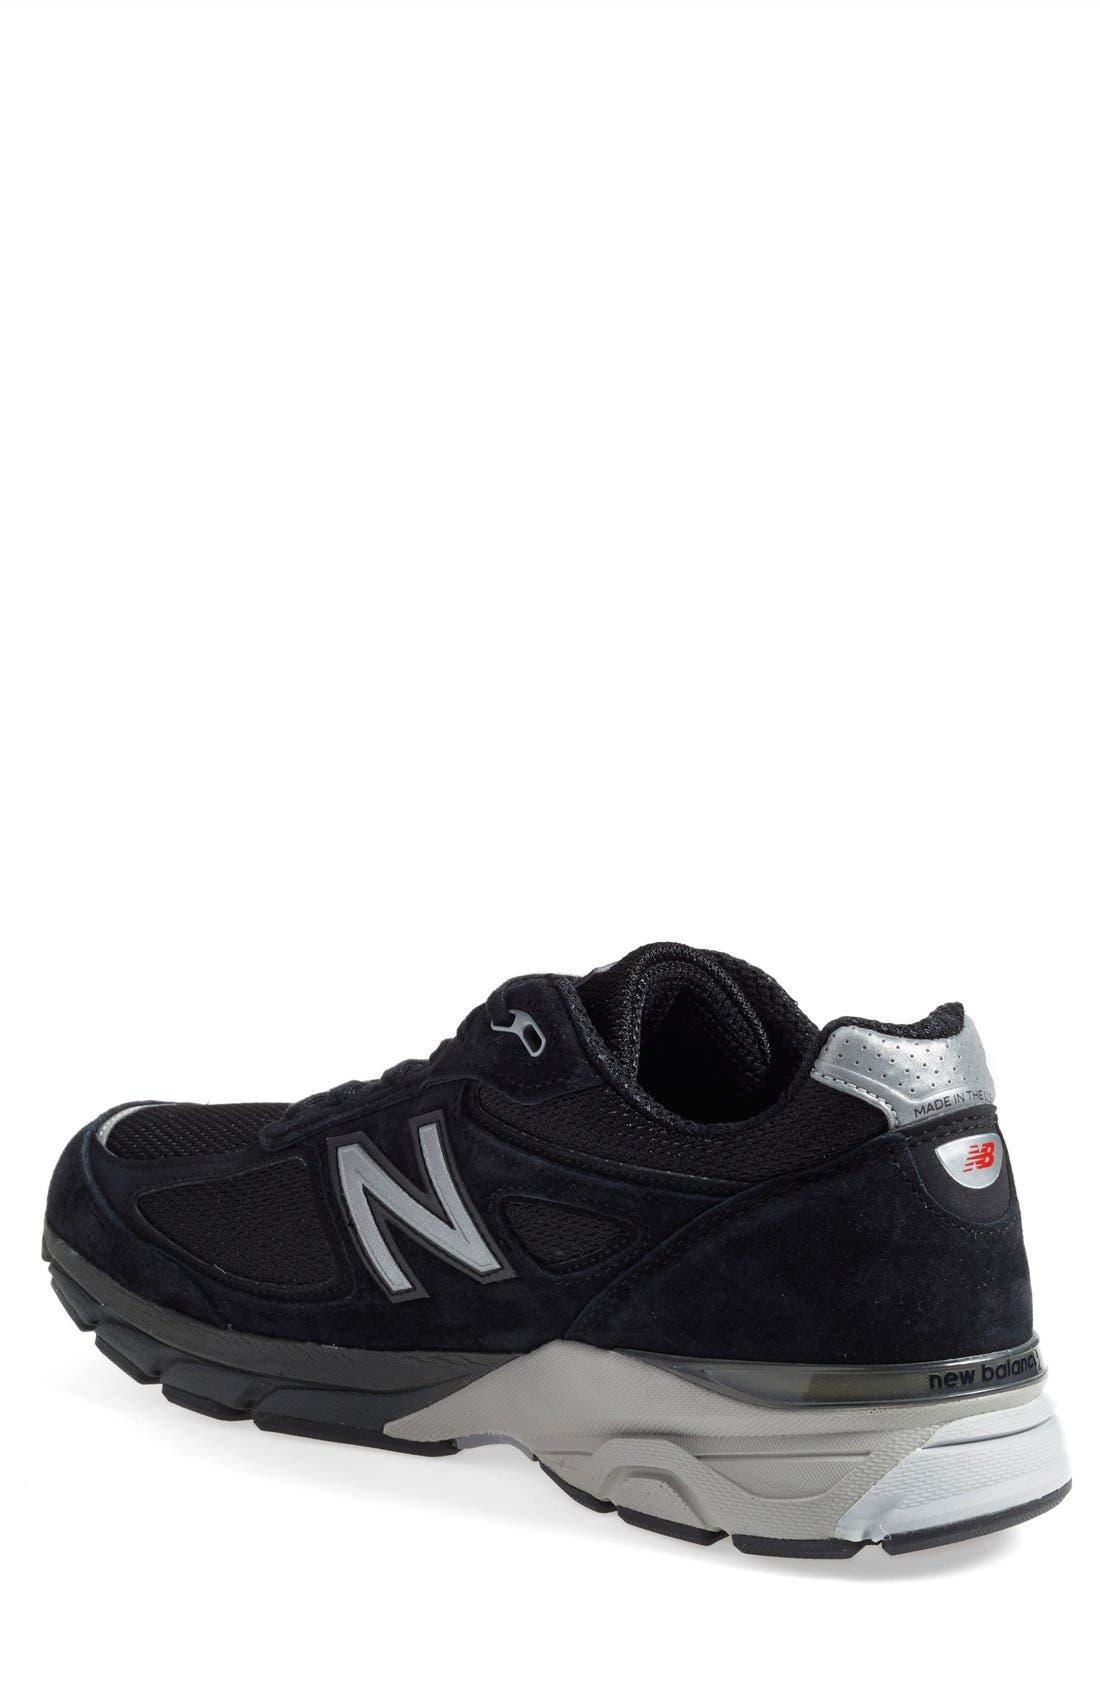 Alternate Image 2  - New Balance '990' Running Shoe (Men)